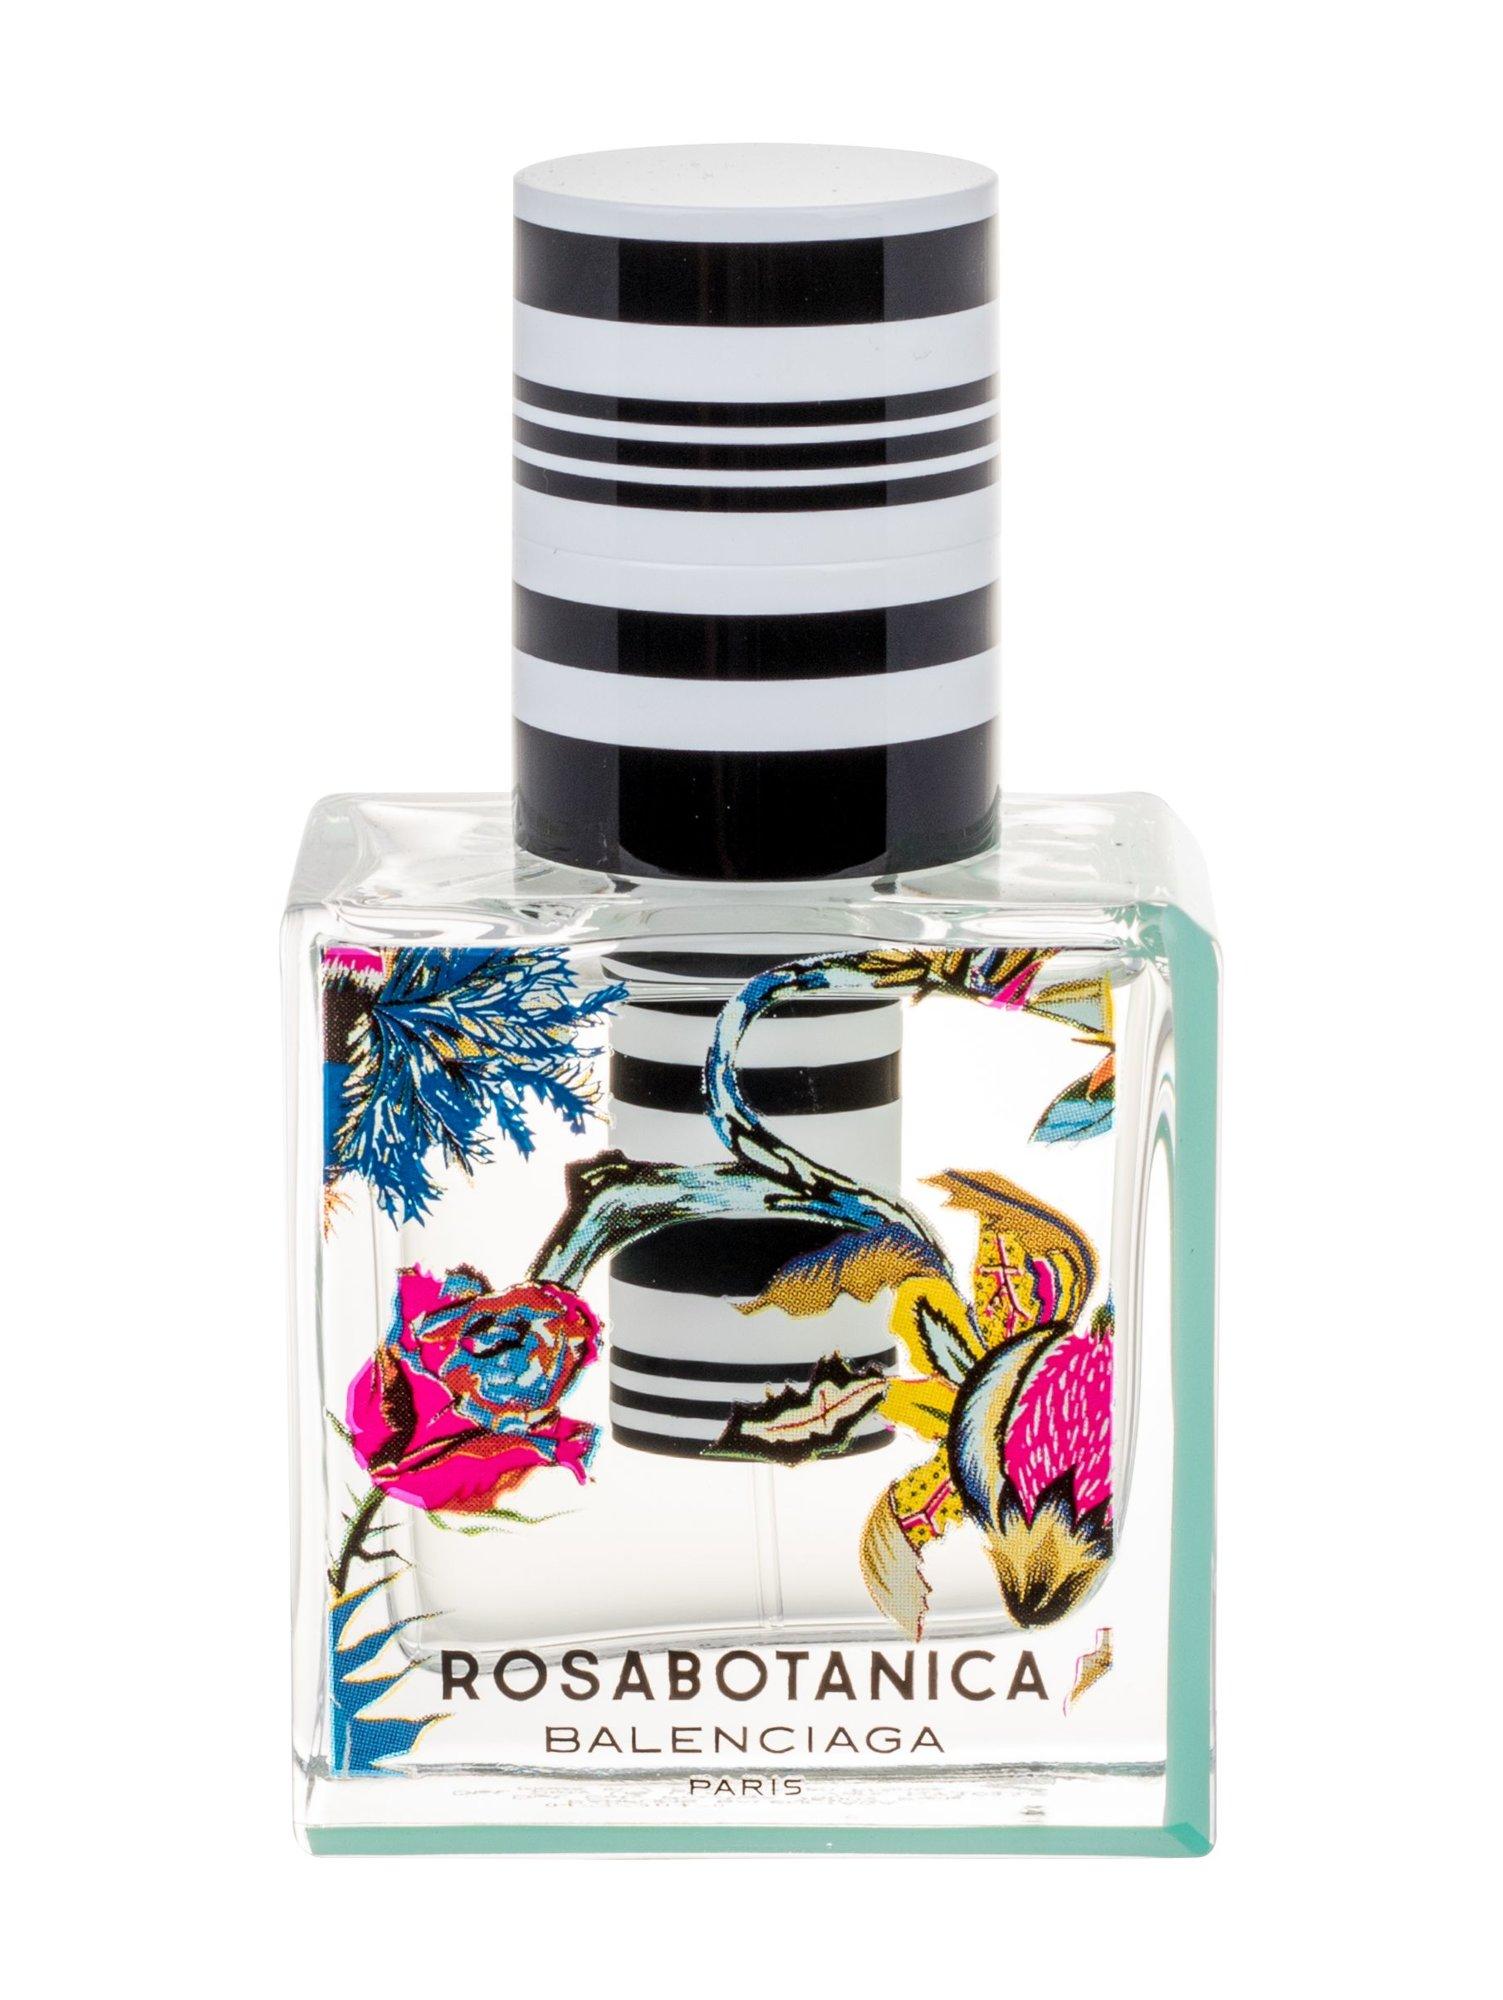 Balenciaga Rosabotanica EDP 50ml